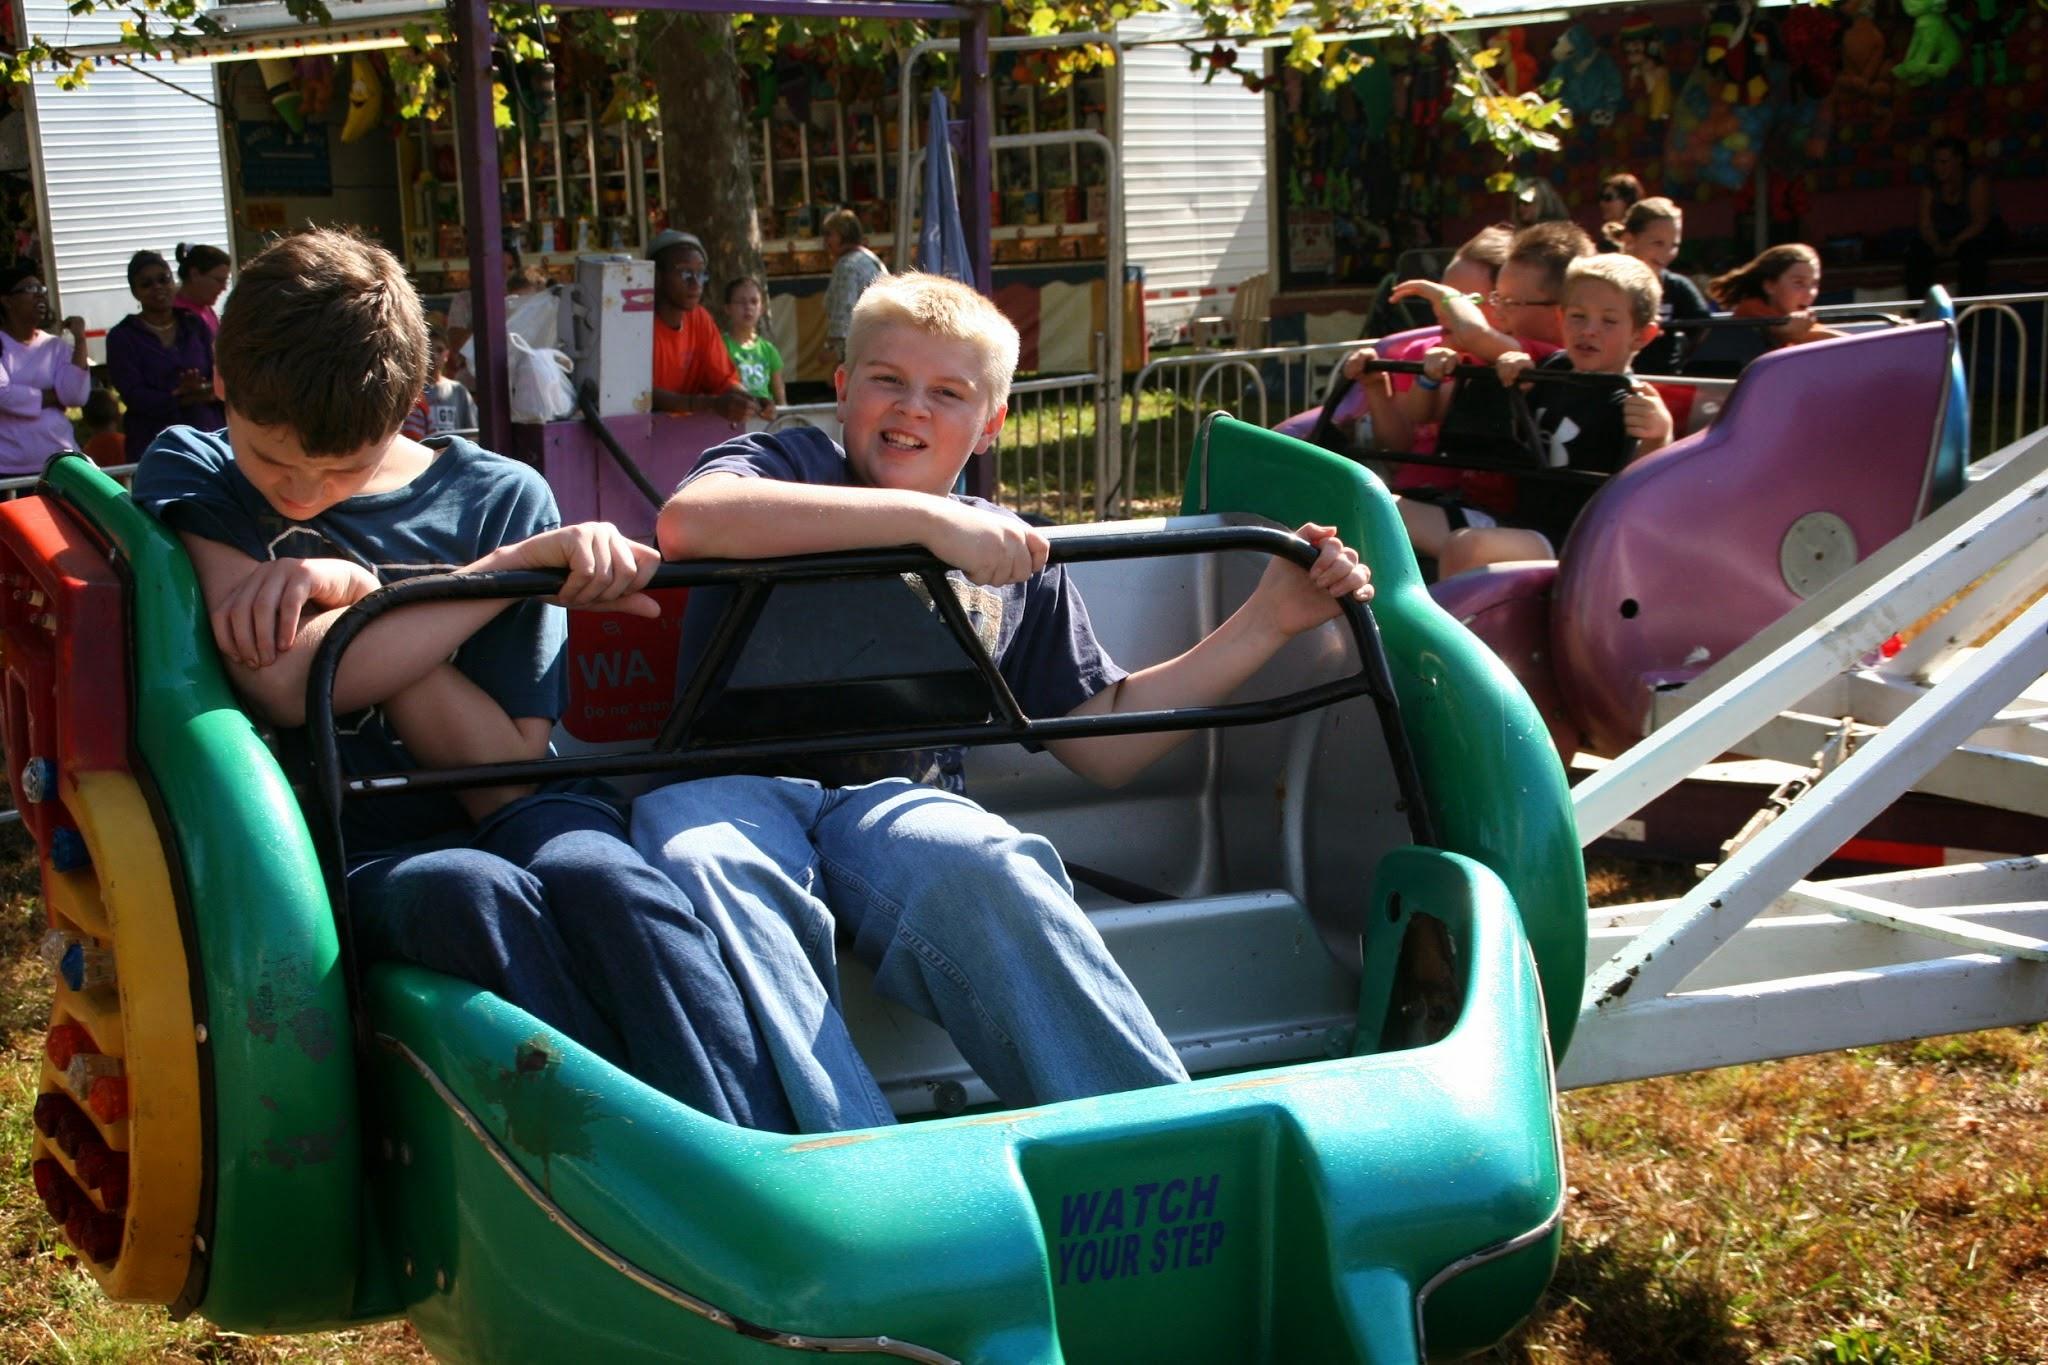 carnival-rides-8